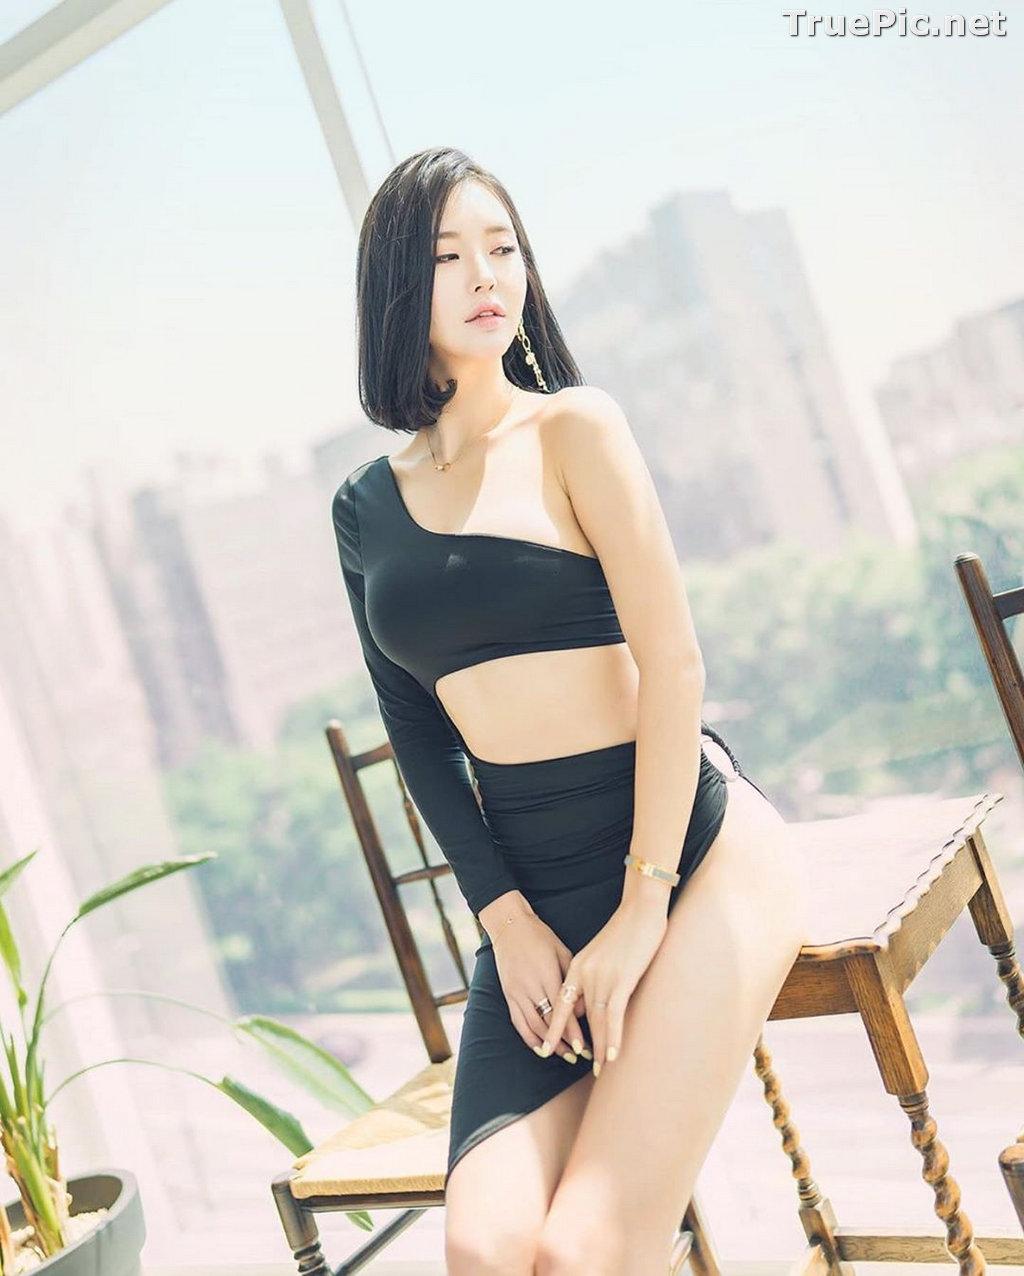 Image Korean Sexy Model - Choi Byeol Ha (최별하) Hot Photos 2020 - TruePic.net - Picture-7